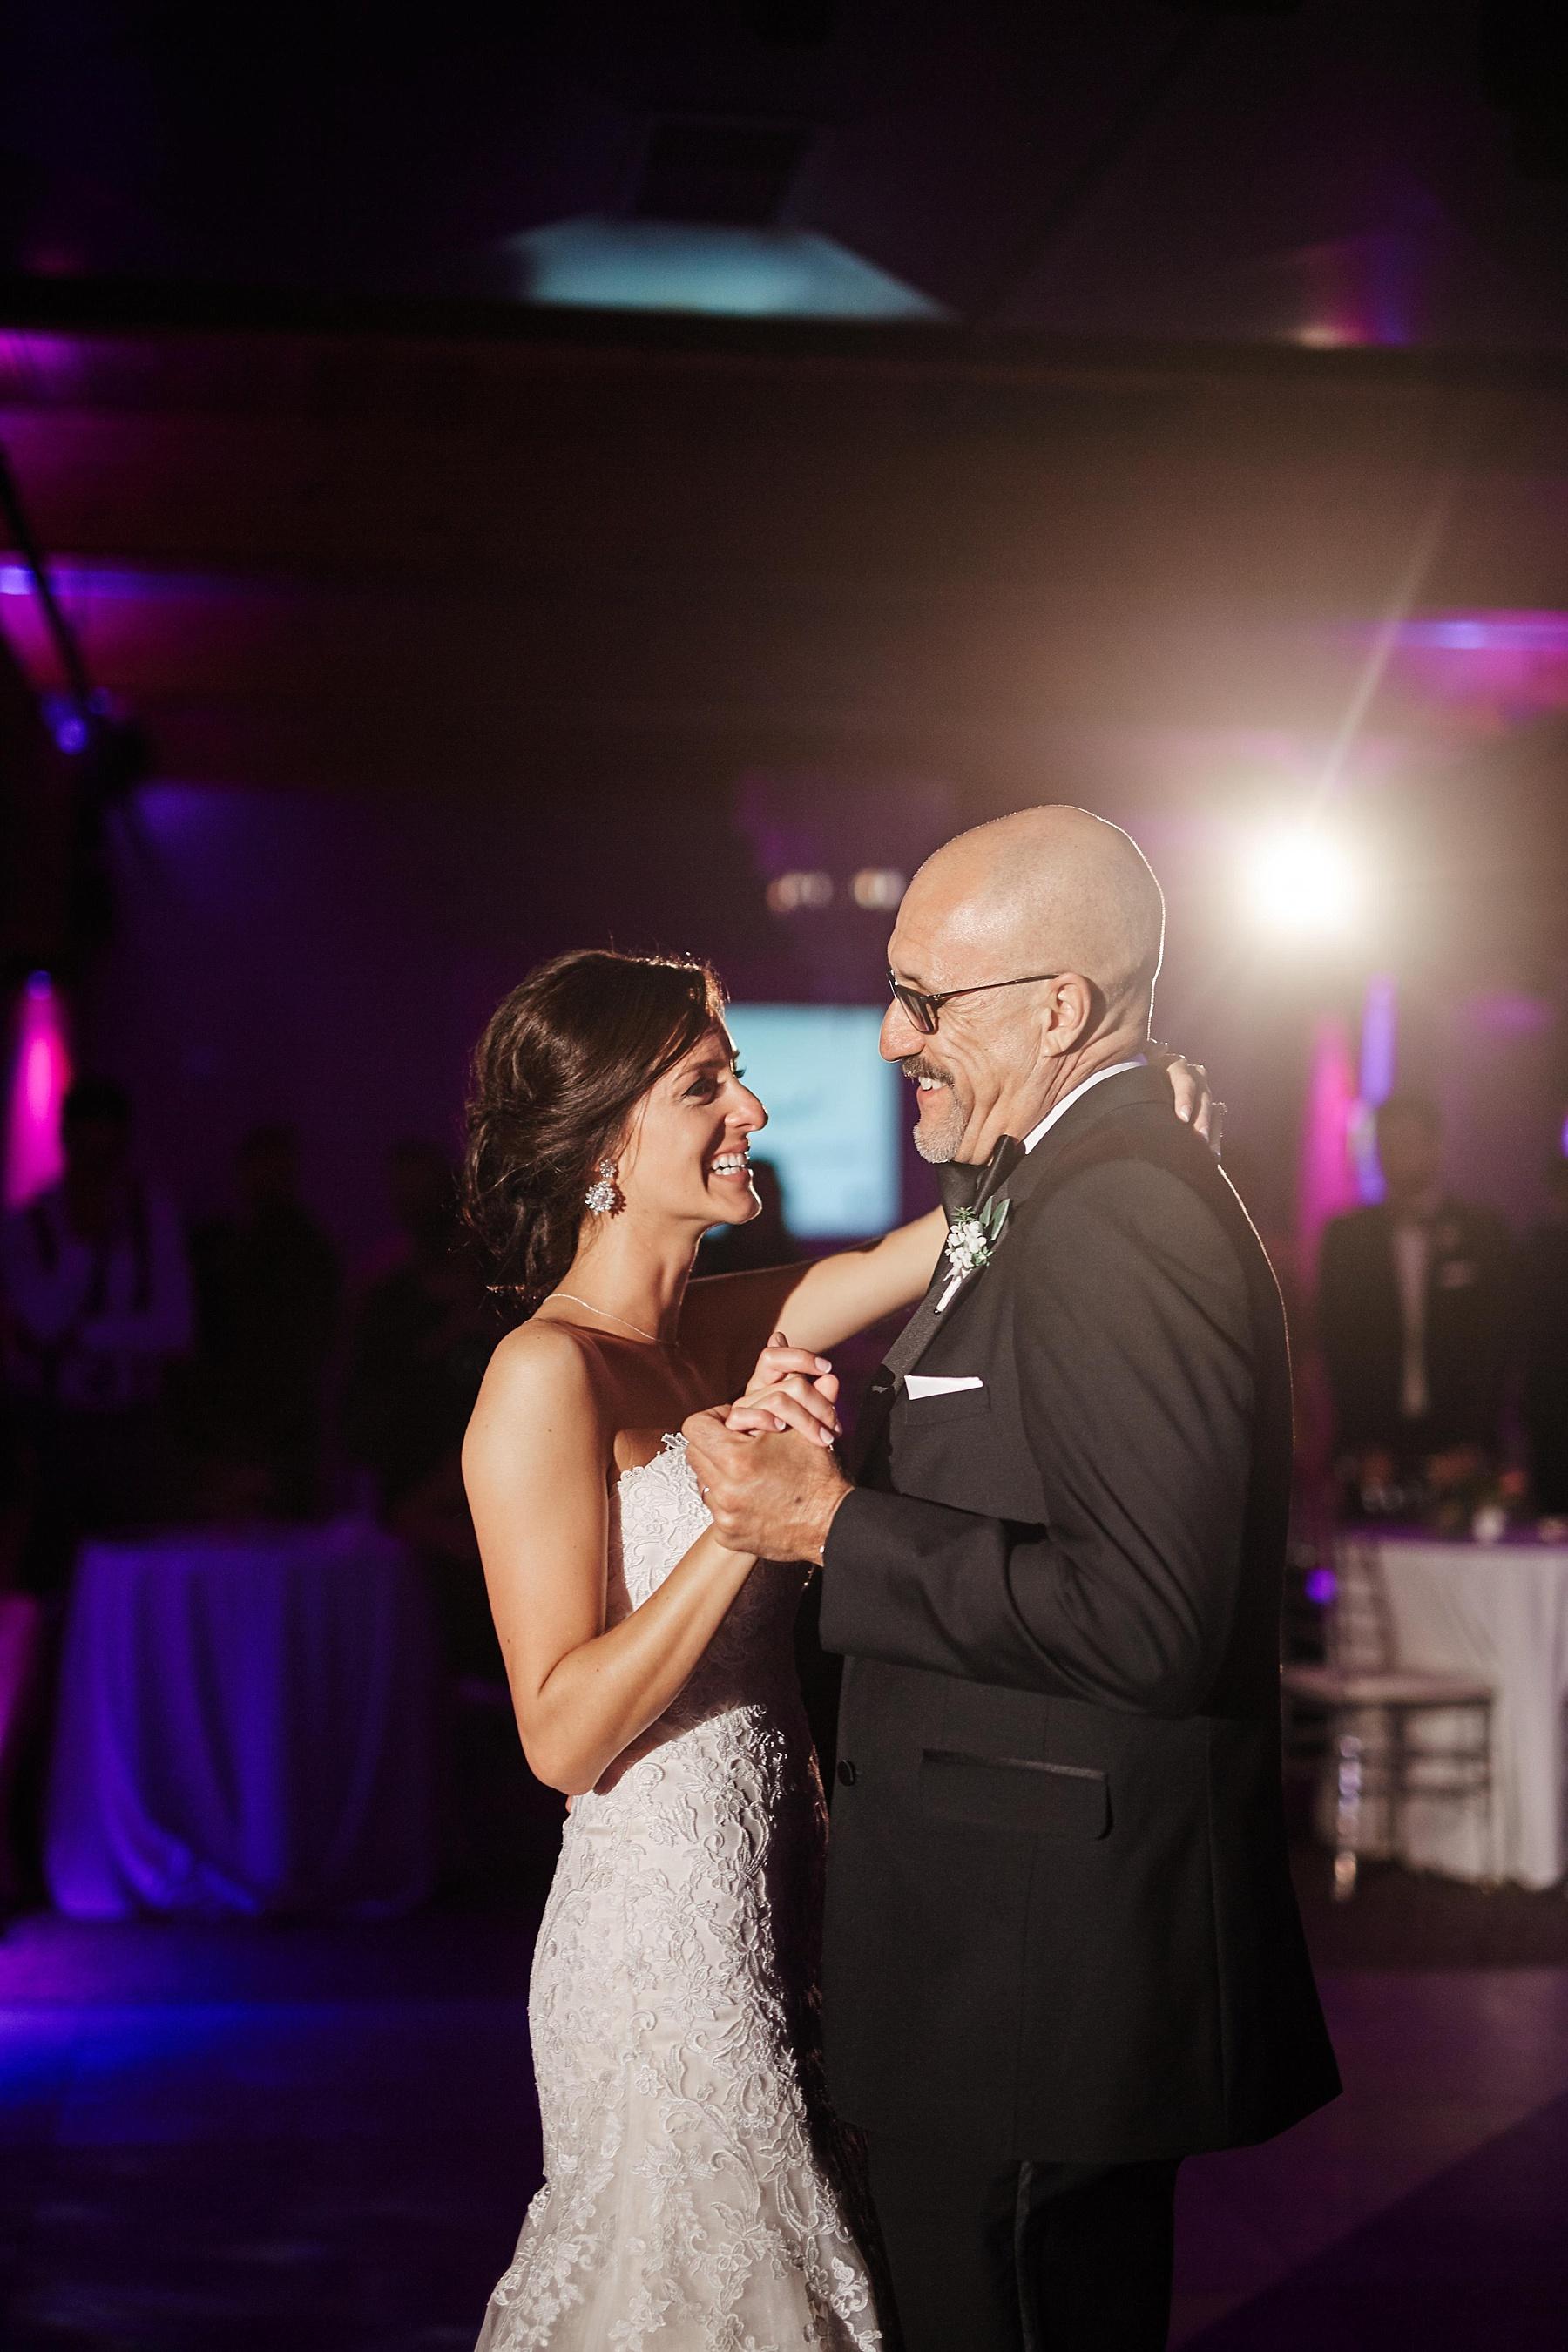 ABULAE-Wedding-Saint-paul-MN-Josh-Sofia-Wedding-Mears-Park_0846.jpg